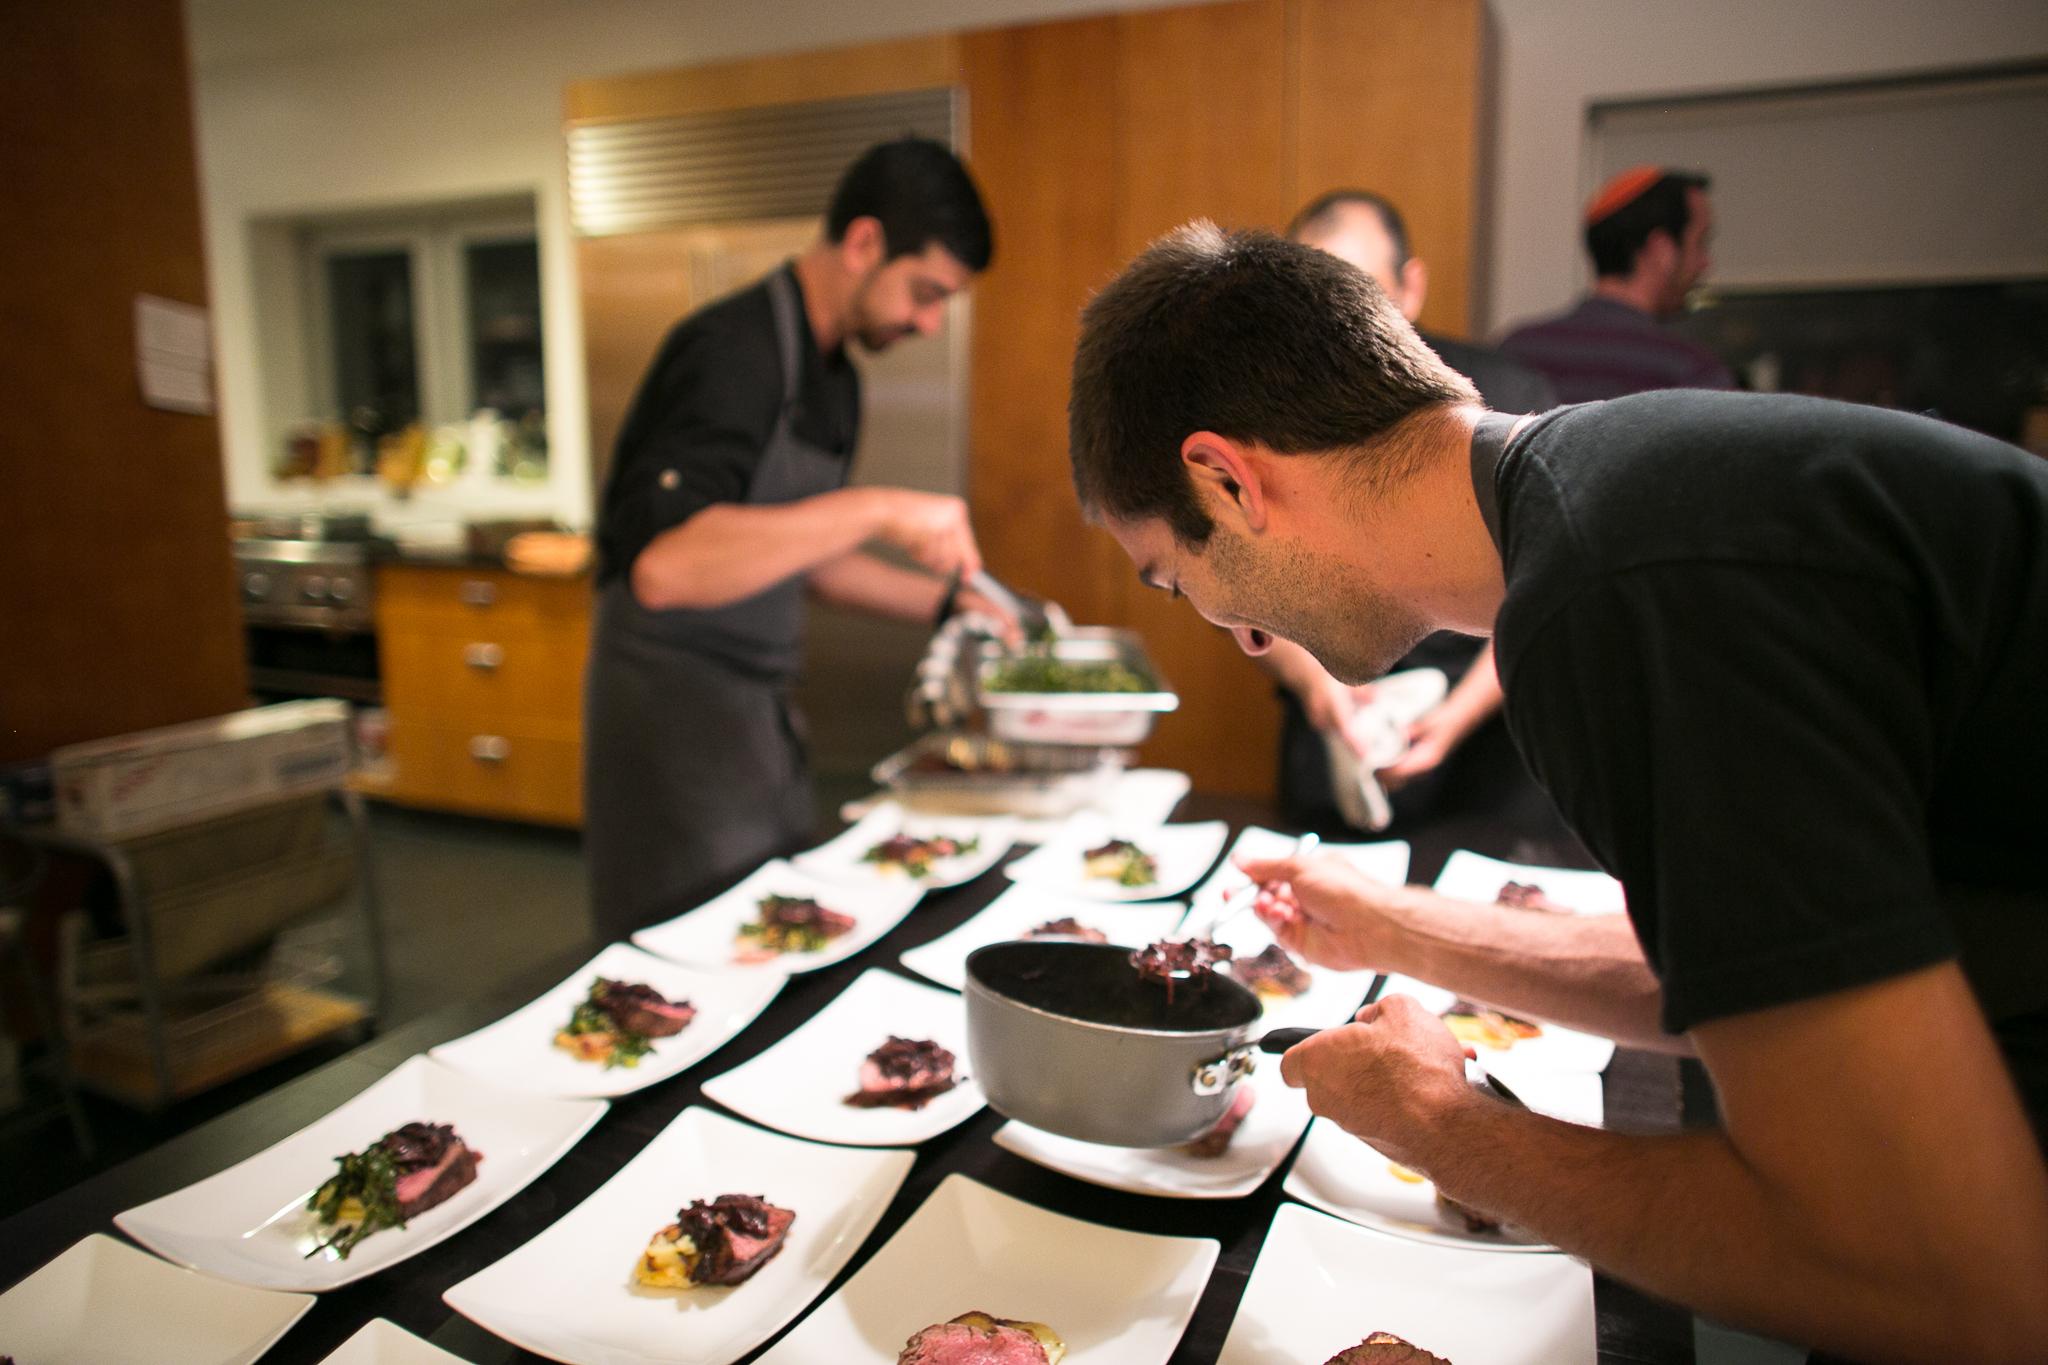 Kosher _ Supper _ Kitchensurfing-187.jpg